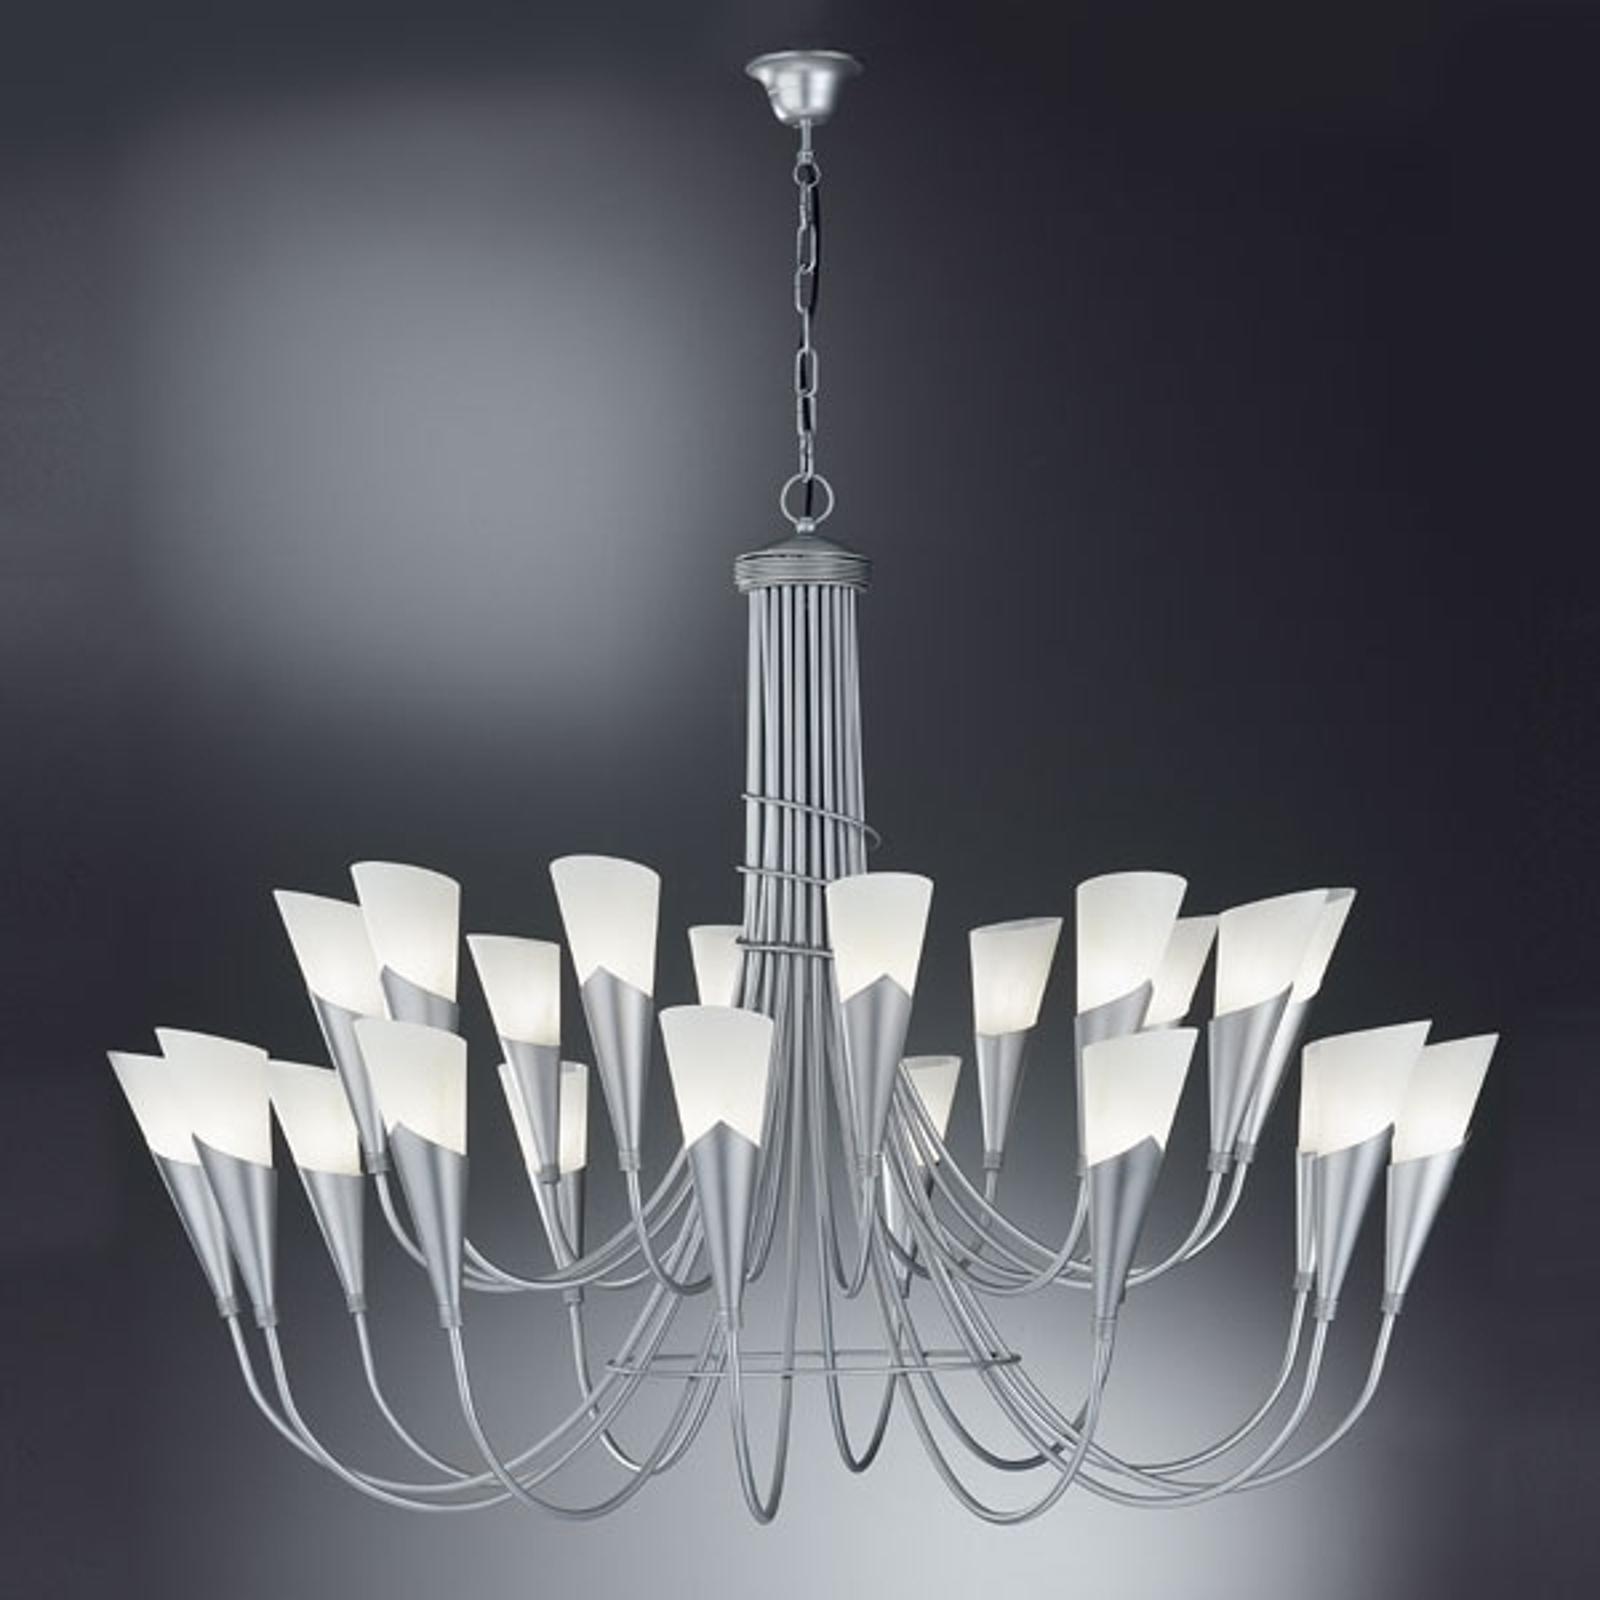 Lampadario CAMPAGNOLA 24 luci, argento